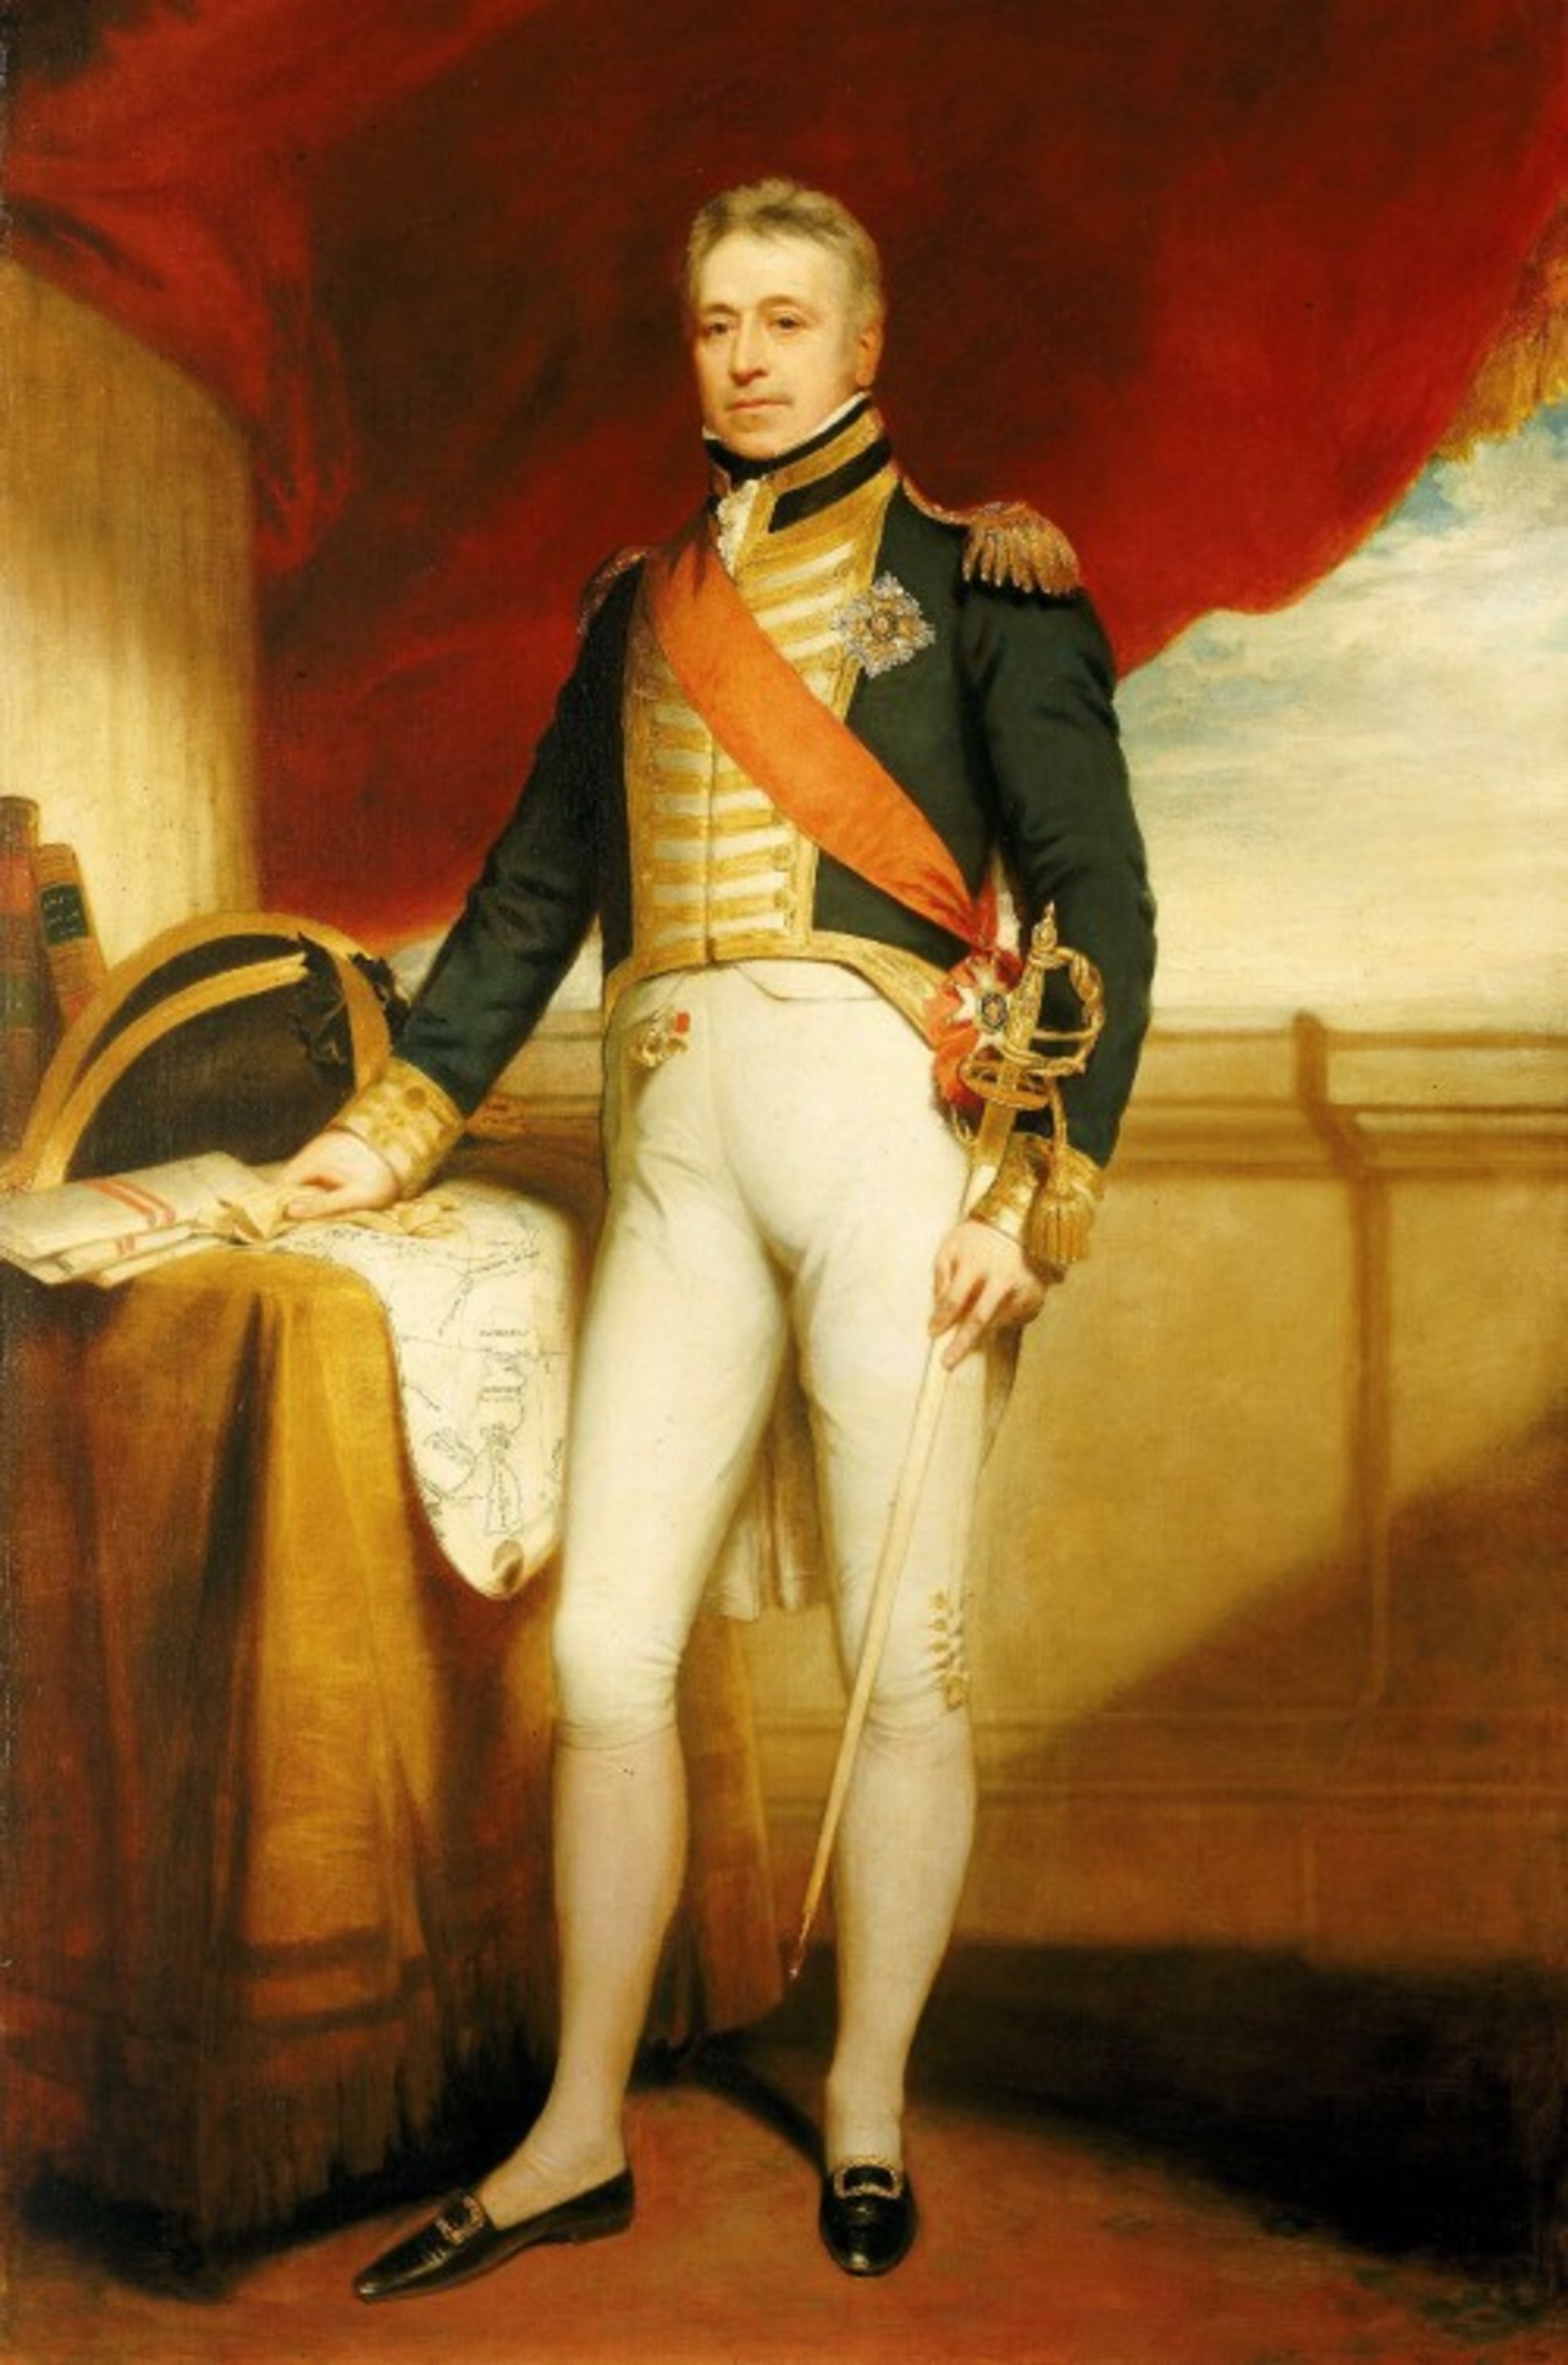 Vice-Admiral-Sir-George-Cockburn-1772-1853-RMG-BHC2618.jpg